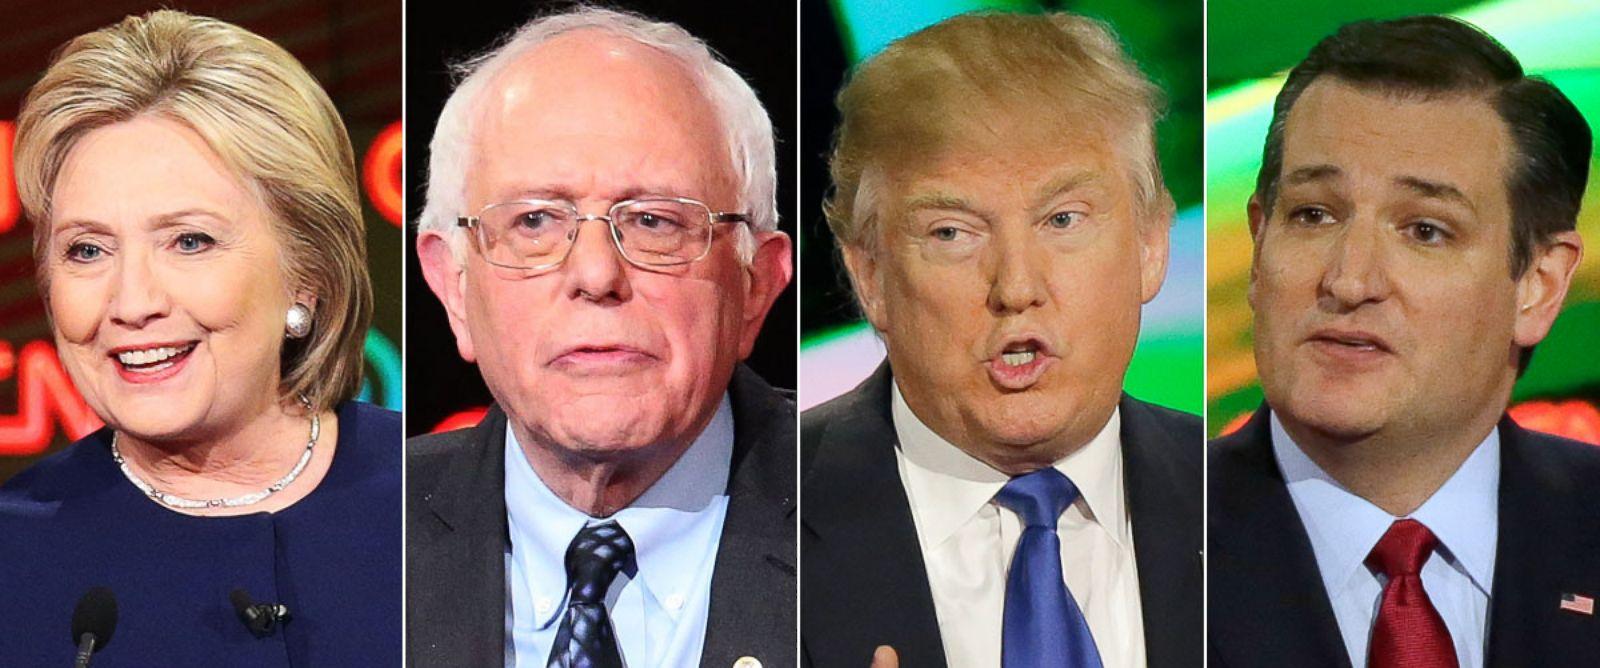 PHOTO: (L-R) Democratic presidential candidates Hillary Clinton and Senator Bernie Sanders (D-VT) speak on March 6, 2016 in Flint, Mich. | Republican presidential candidates Donald Trump and Sen. Ted Cruz (R-TX) speak on Feb. 25, 2016 in Houston.